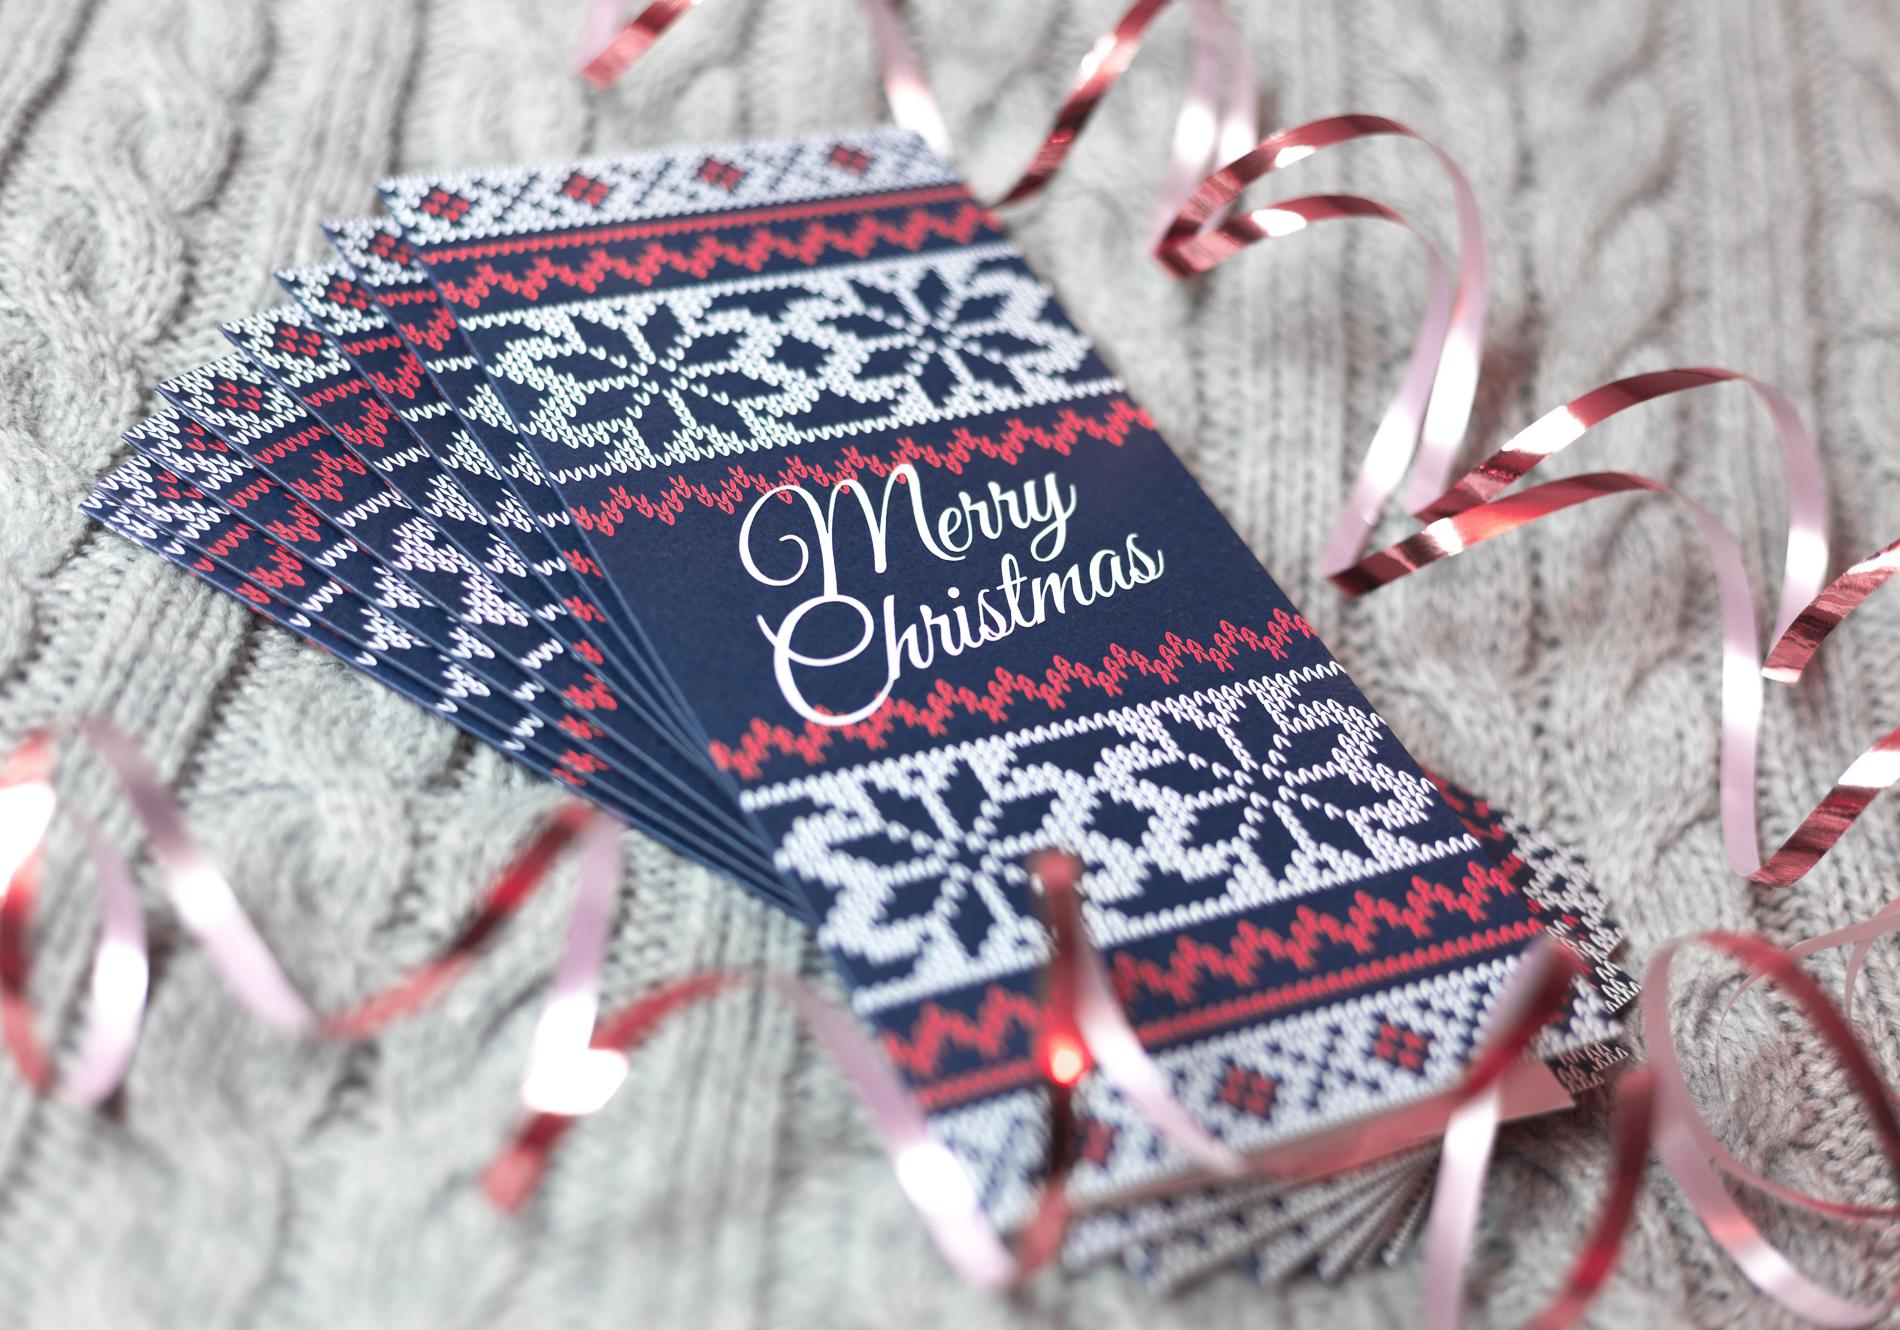 merrychristmas-card-knit2017-4.jpg